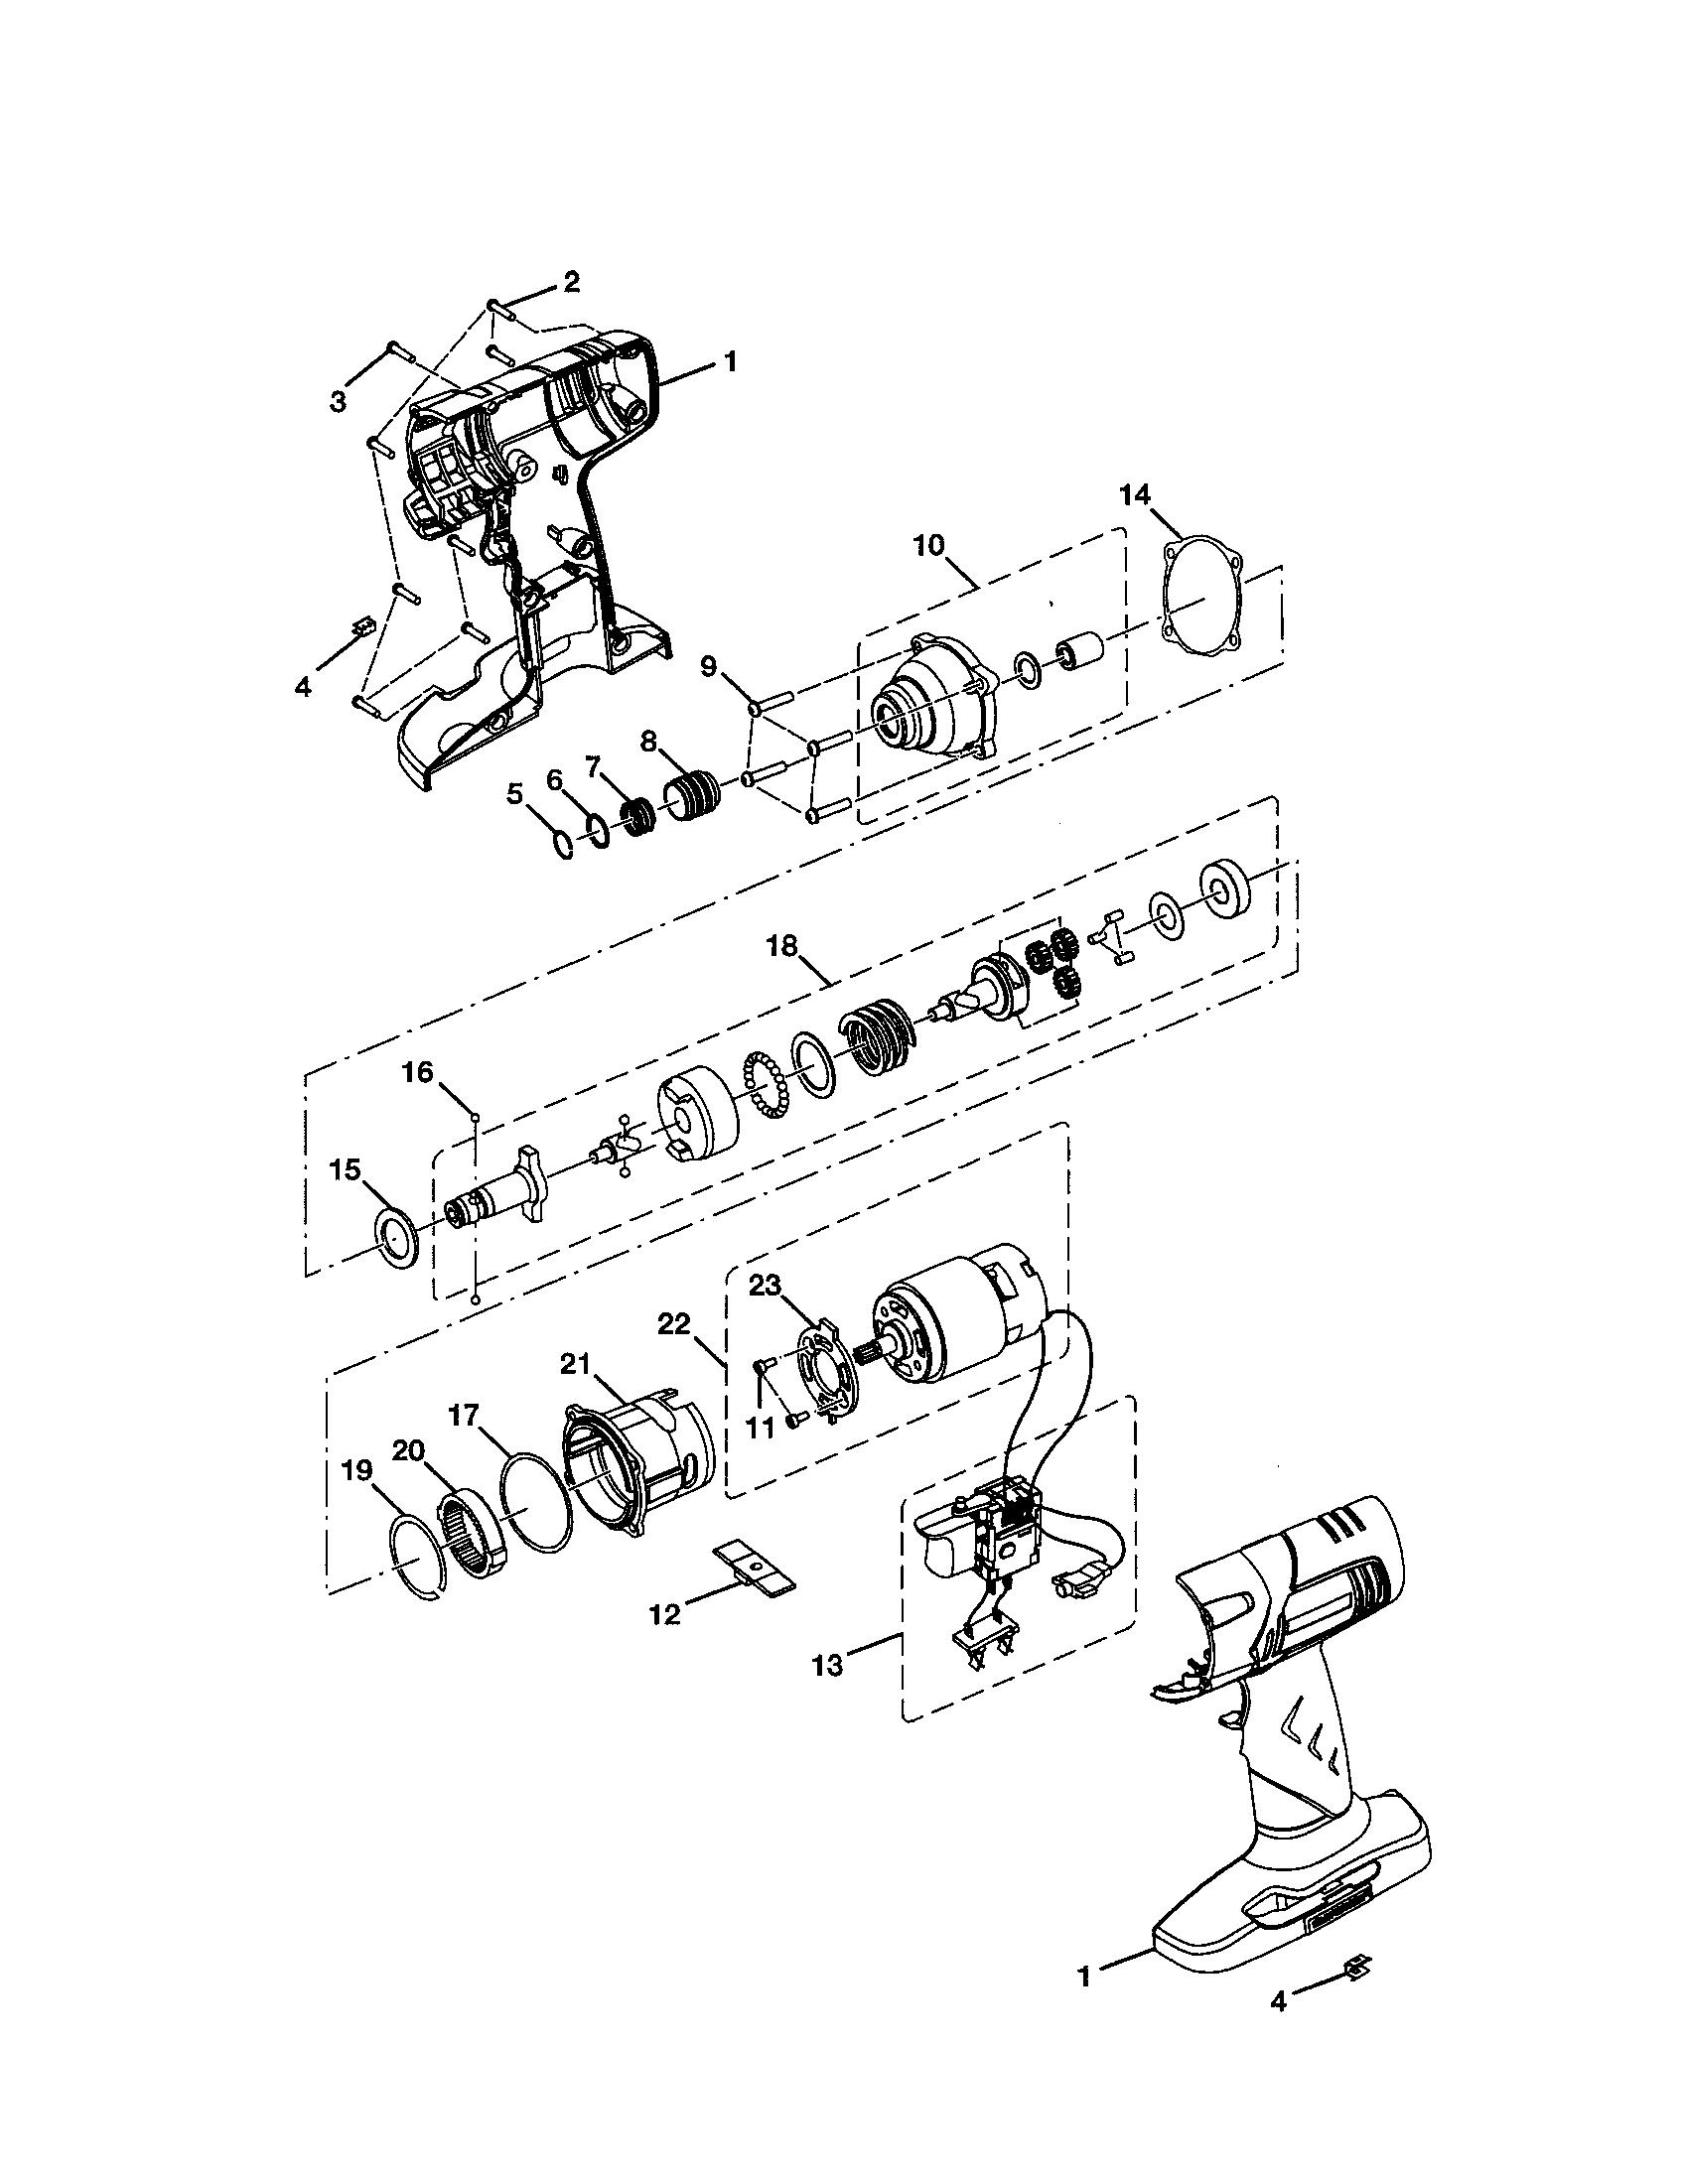 razor dune buggy wiring diagram trailer harness imageresizertool com